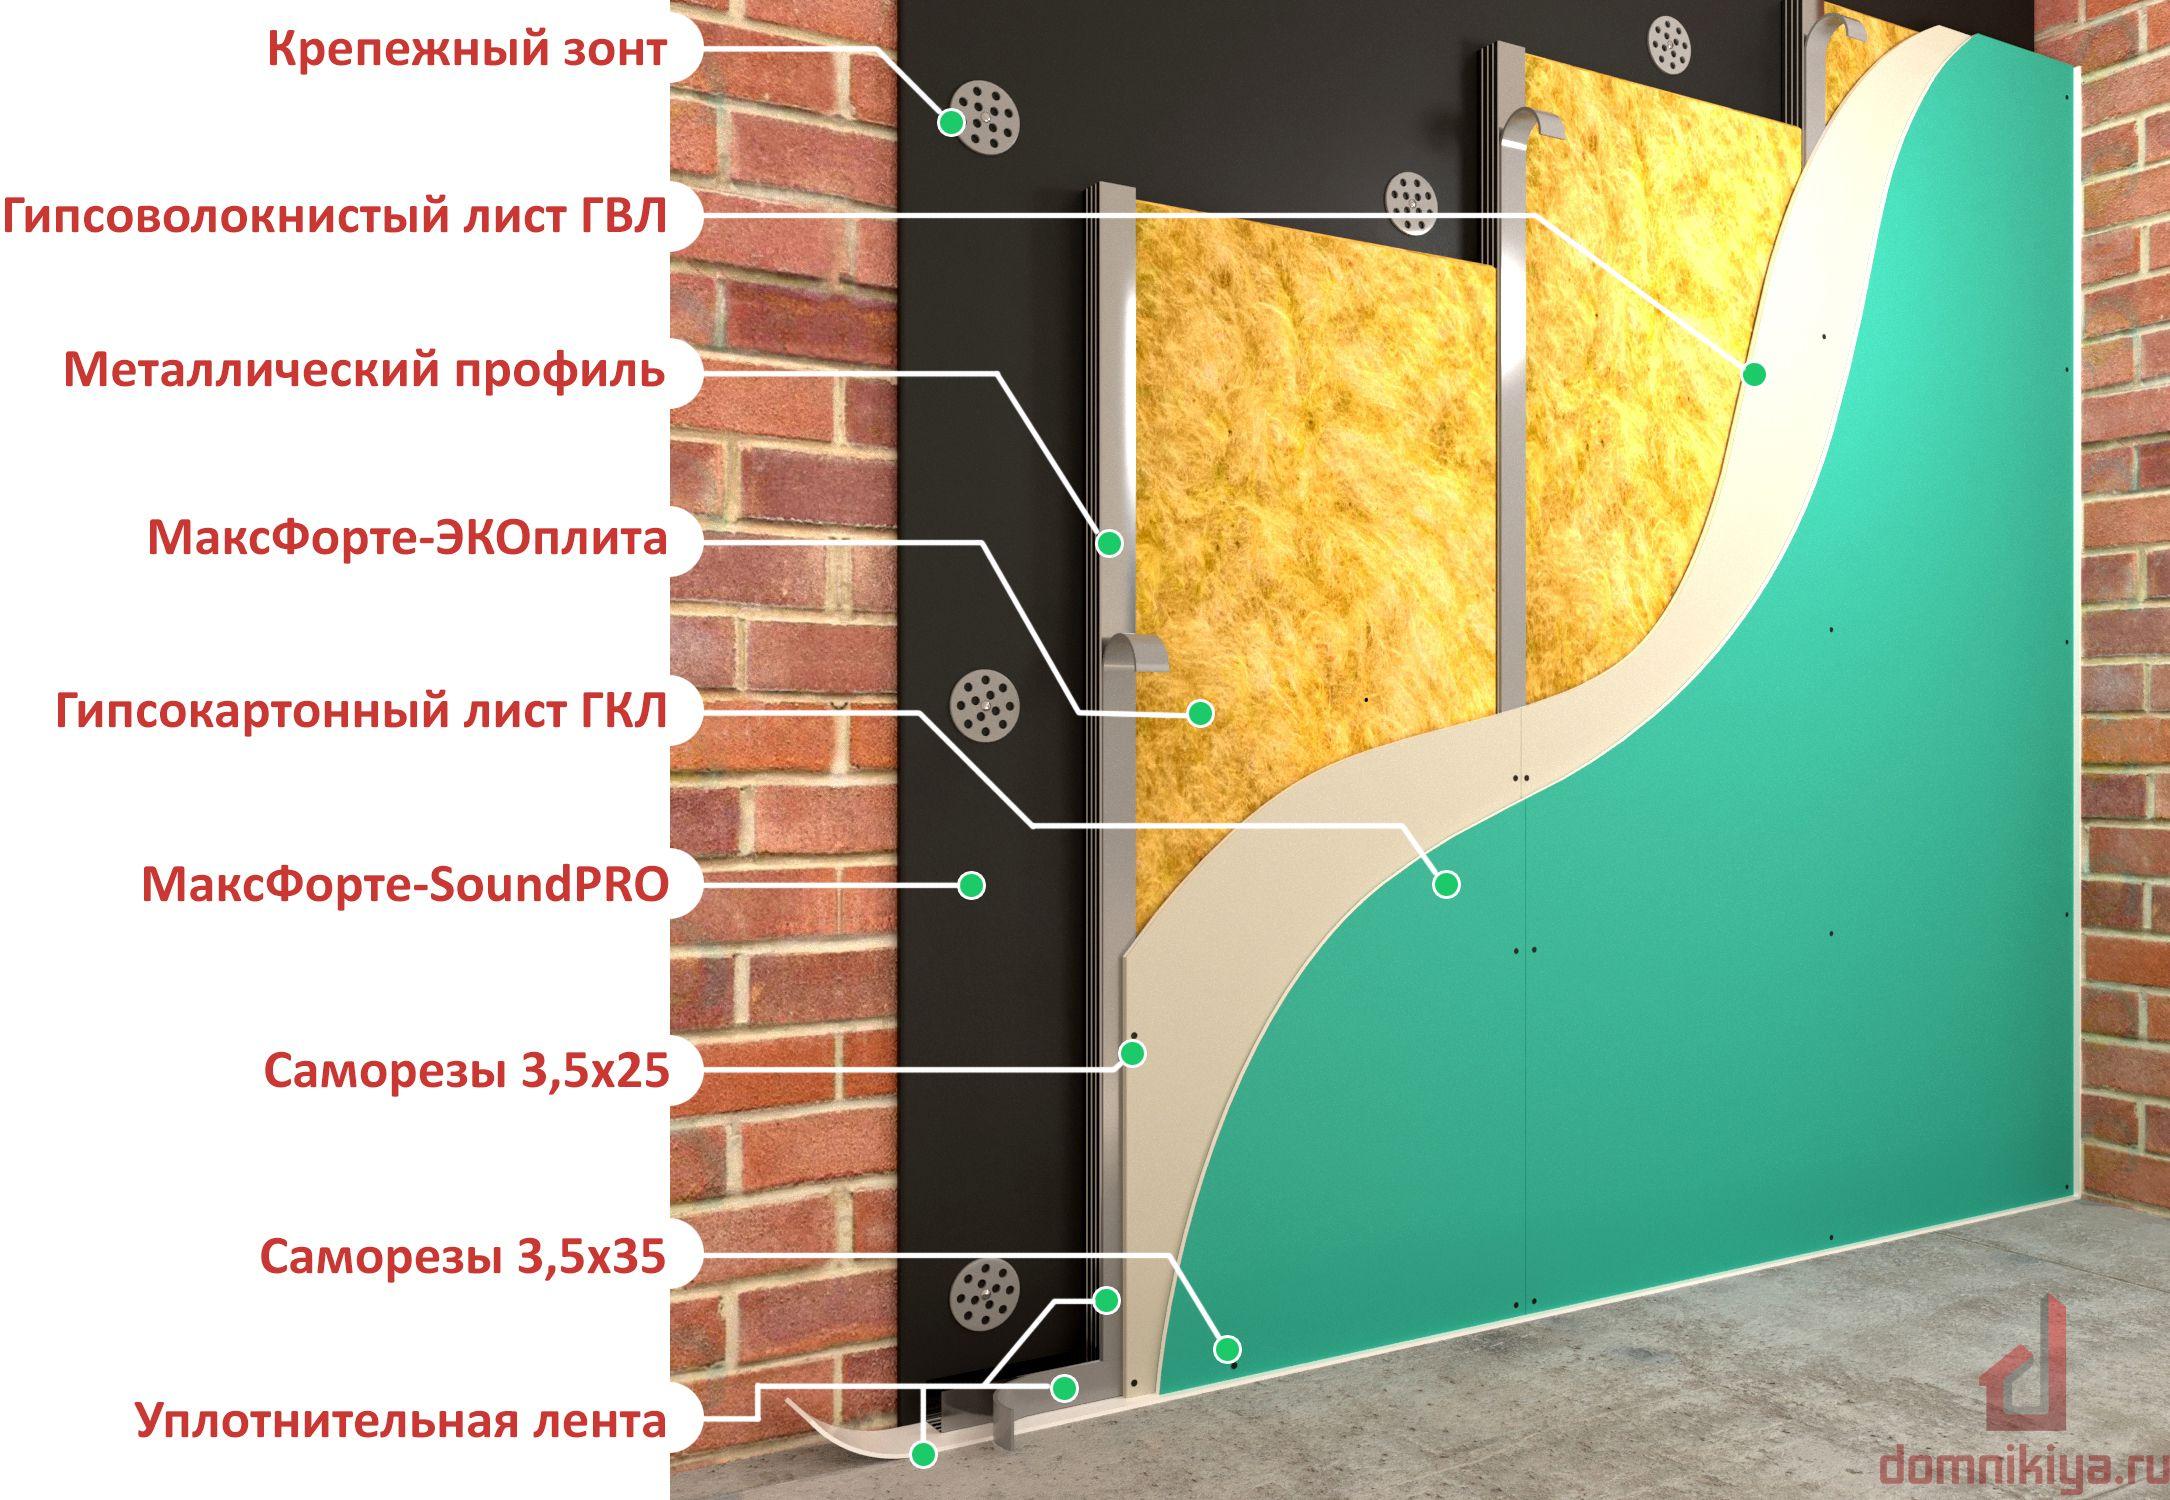 шумоизоляция квартиры материалы для стен